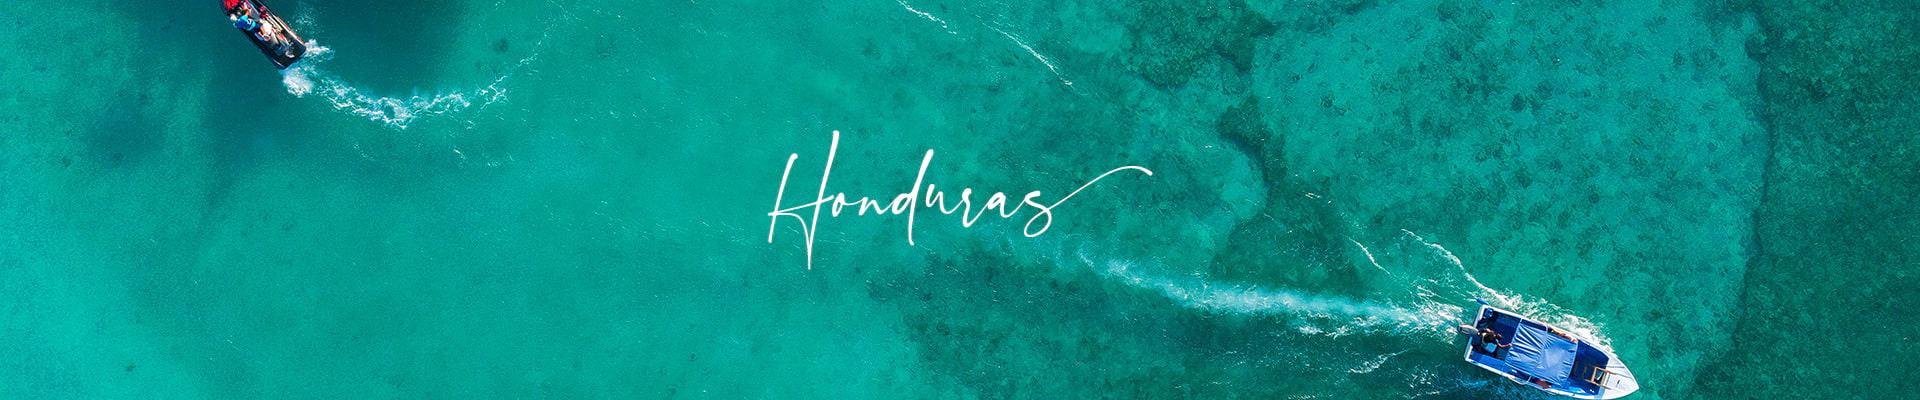 images/panos/desktop/honduras